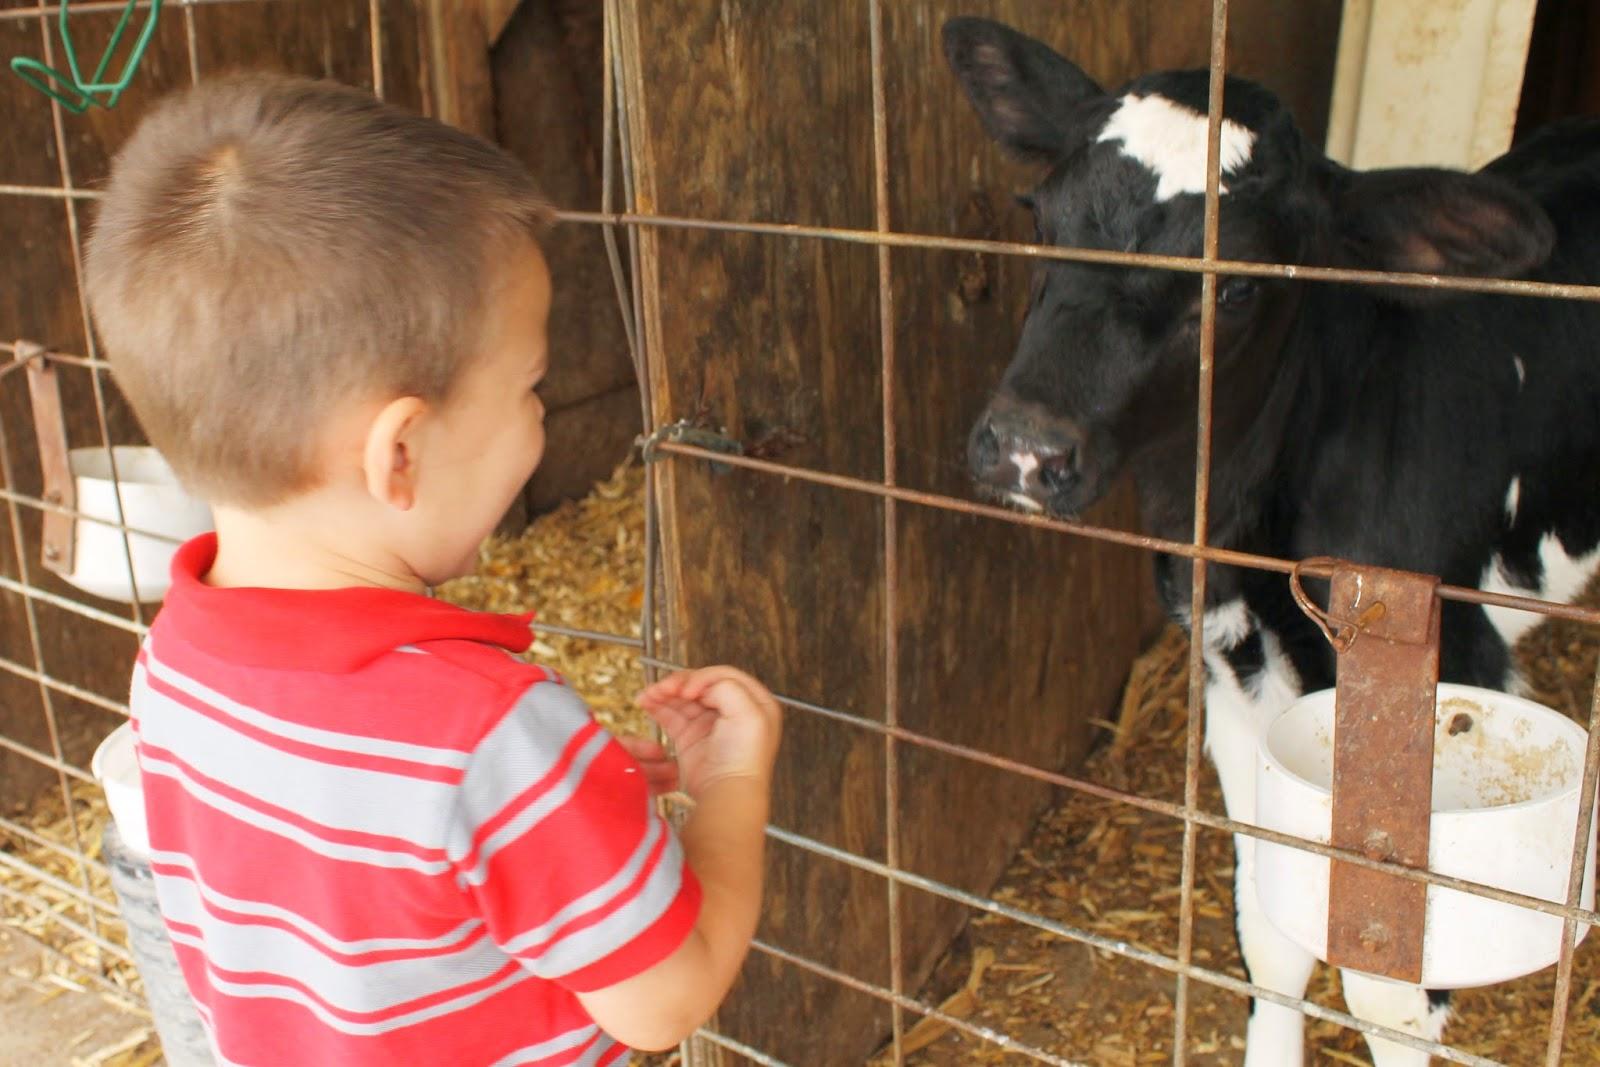 Hansen's Dairy Farm, Hudson, Iowa - Baby Calf